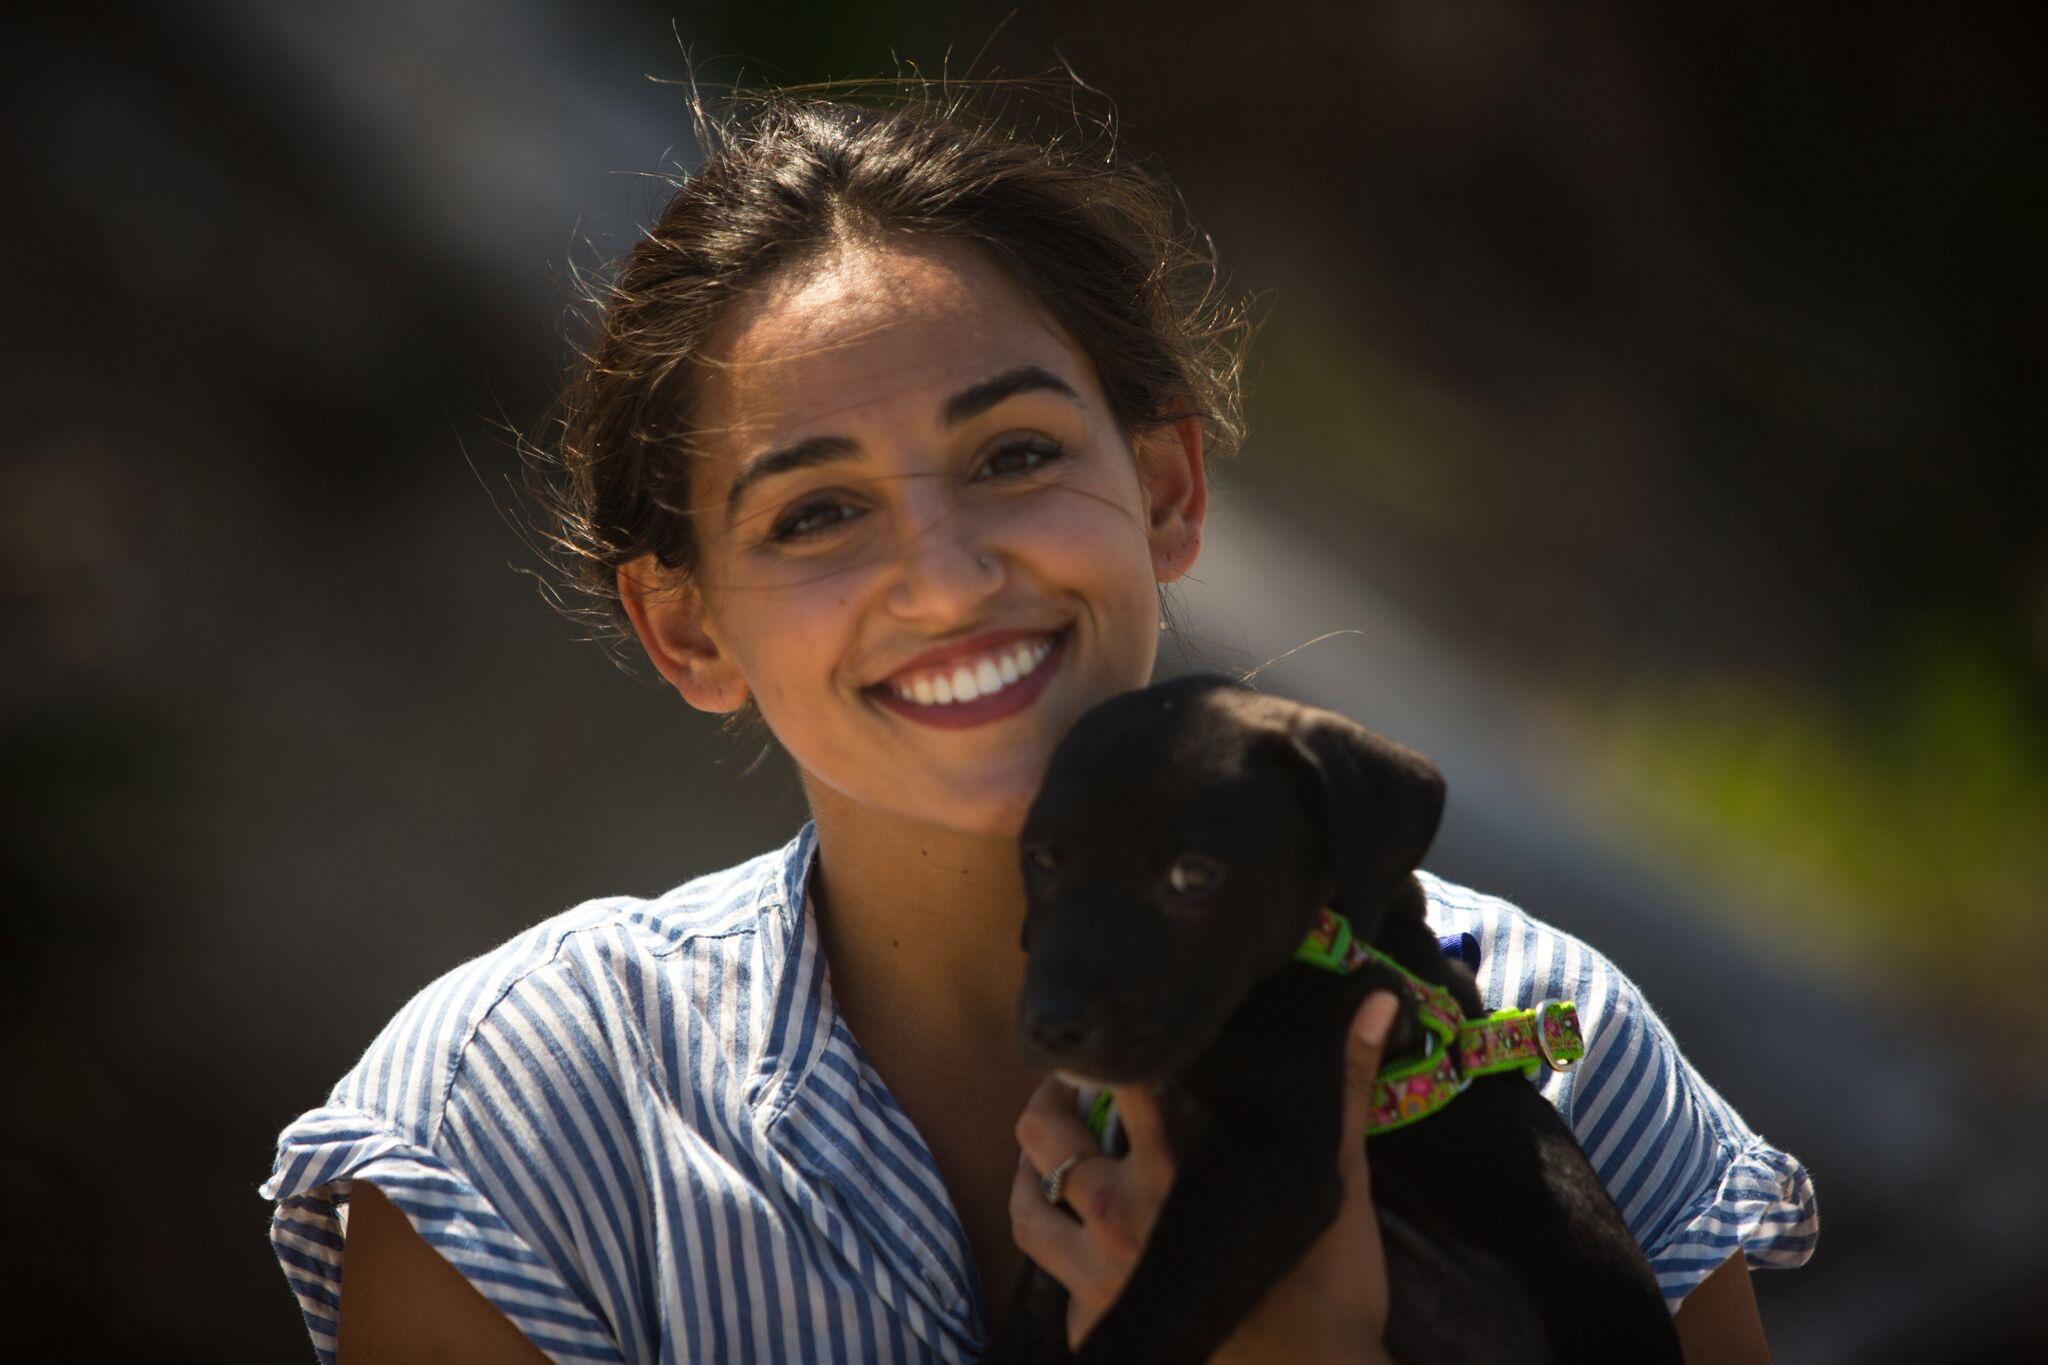 Jordan and her dog, AndiE